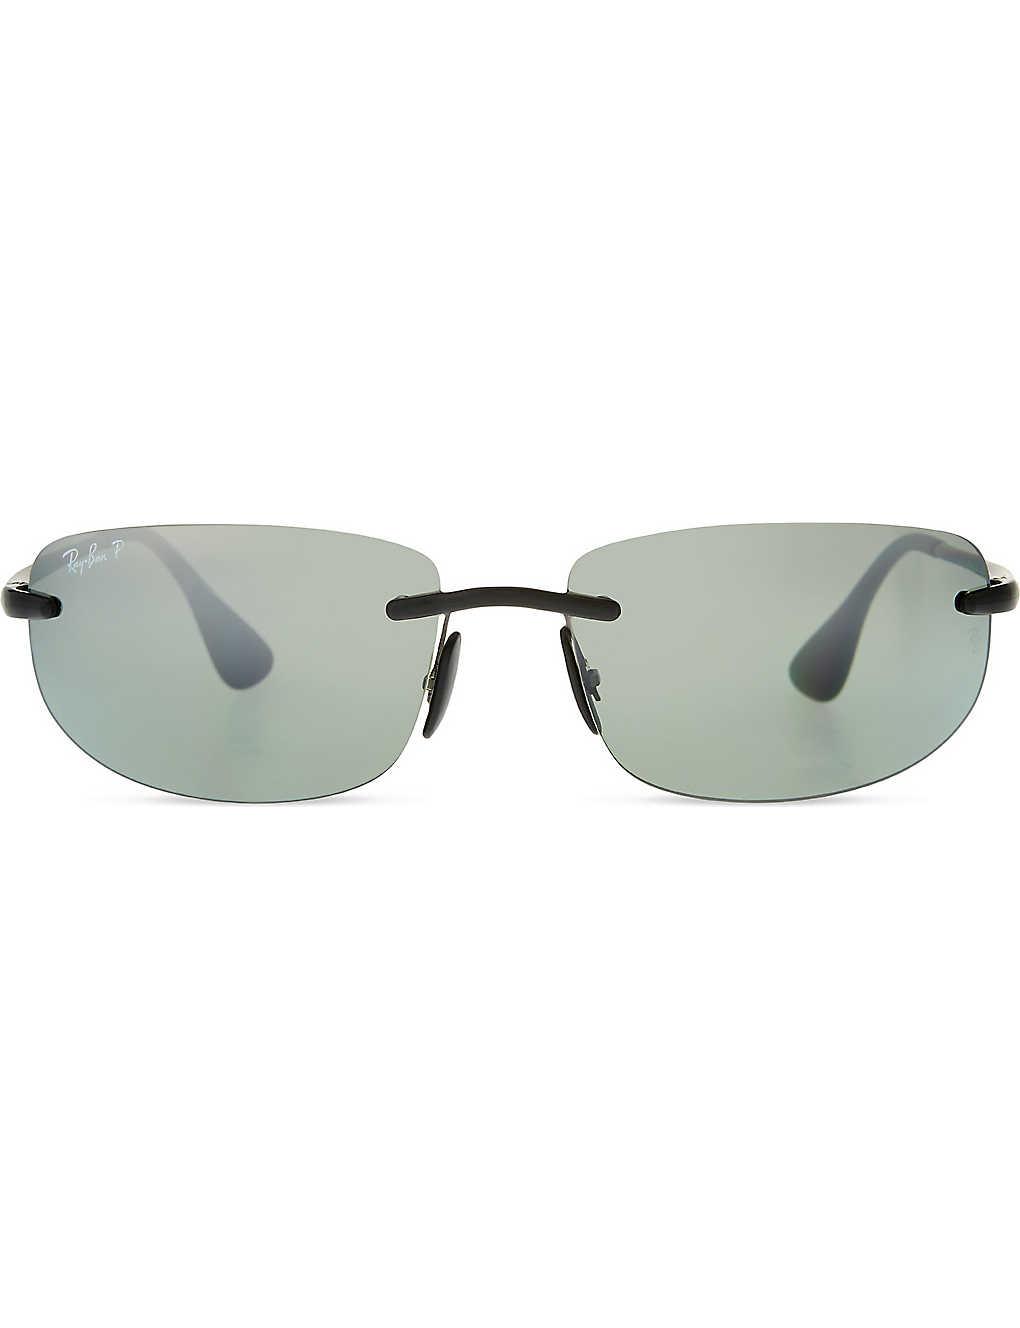 63cbf270db RAY-BAN - Rb4254 chromance rectangle sunglasses